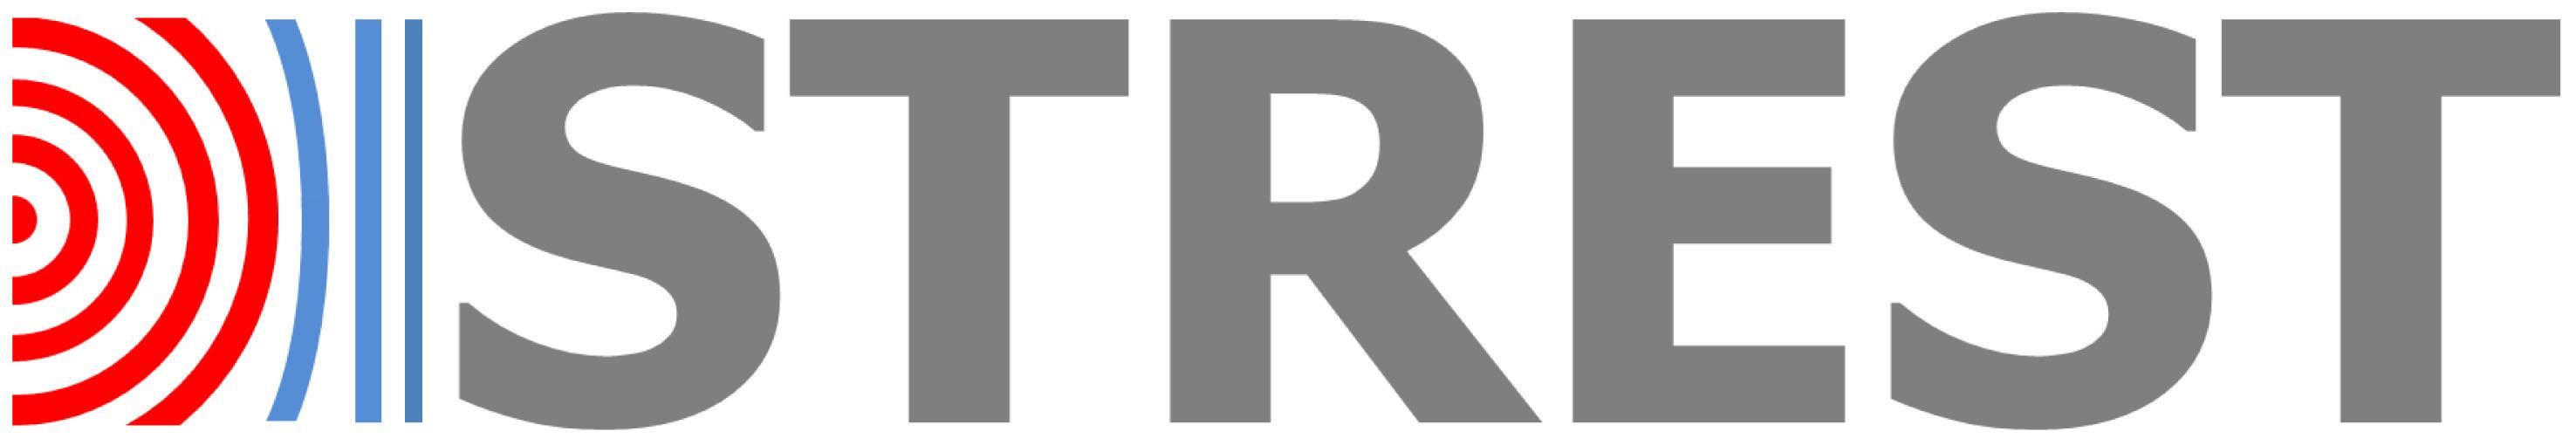 STREST logo